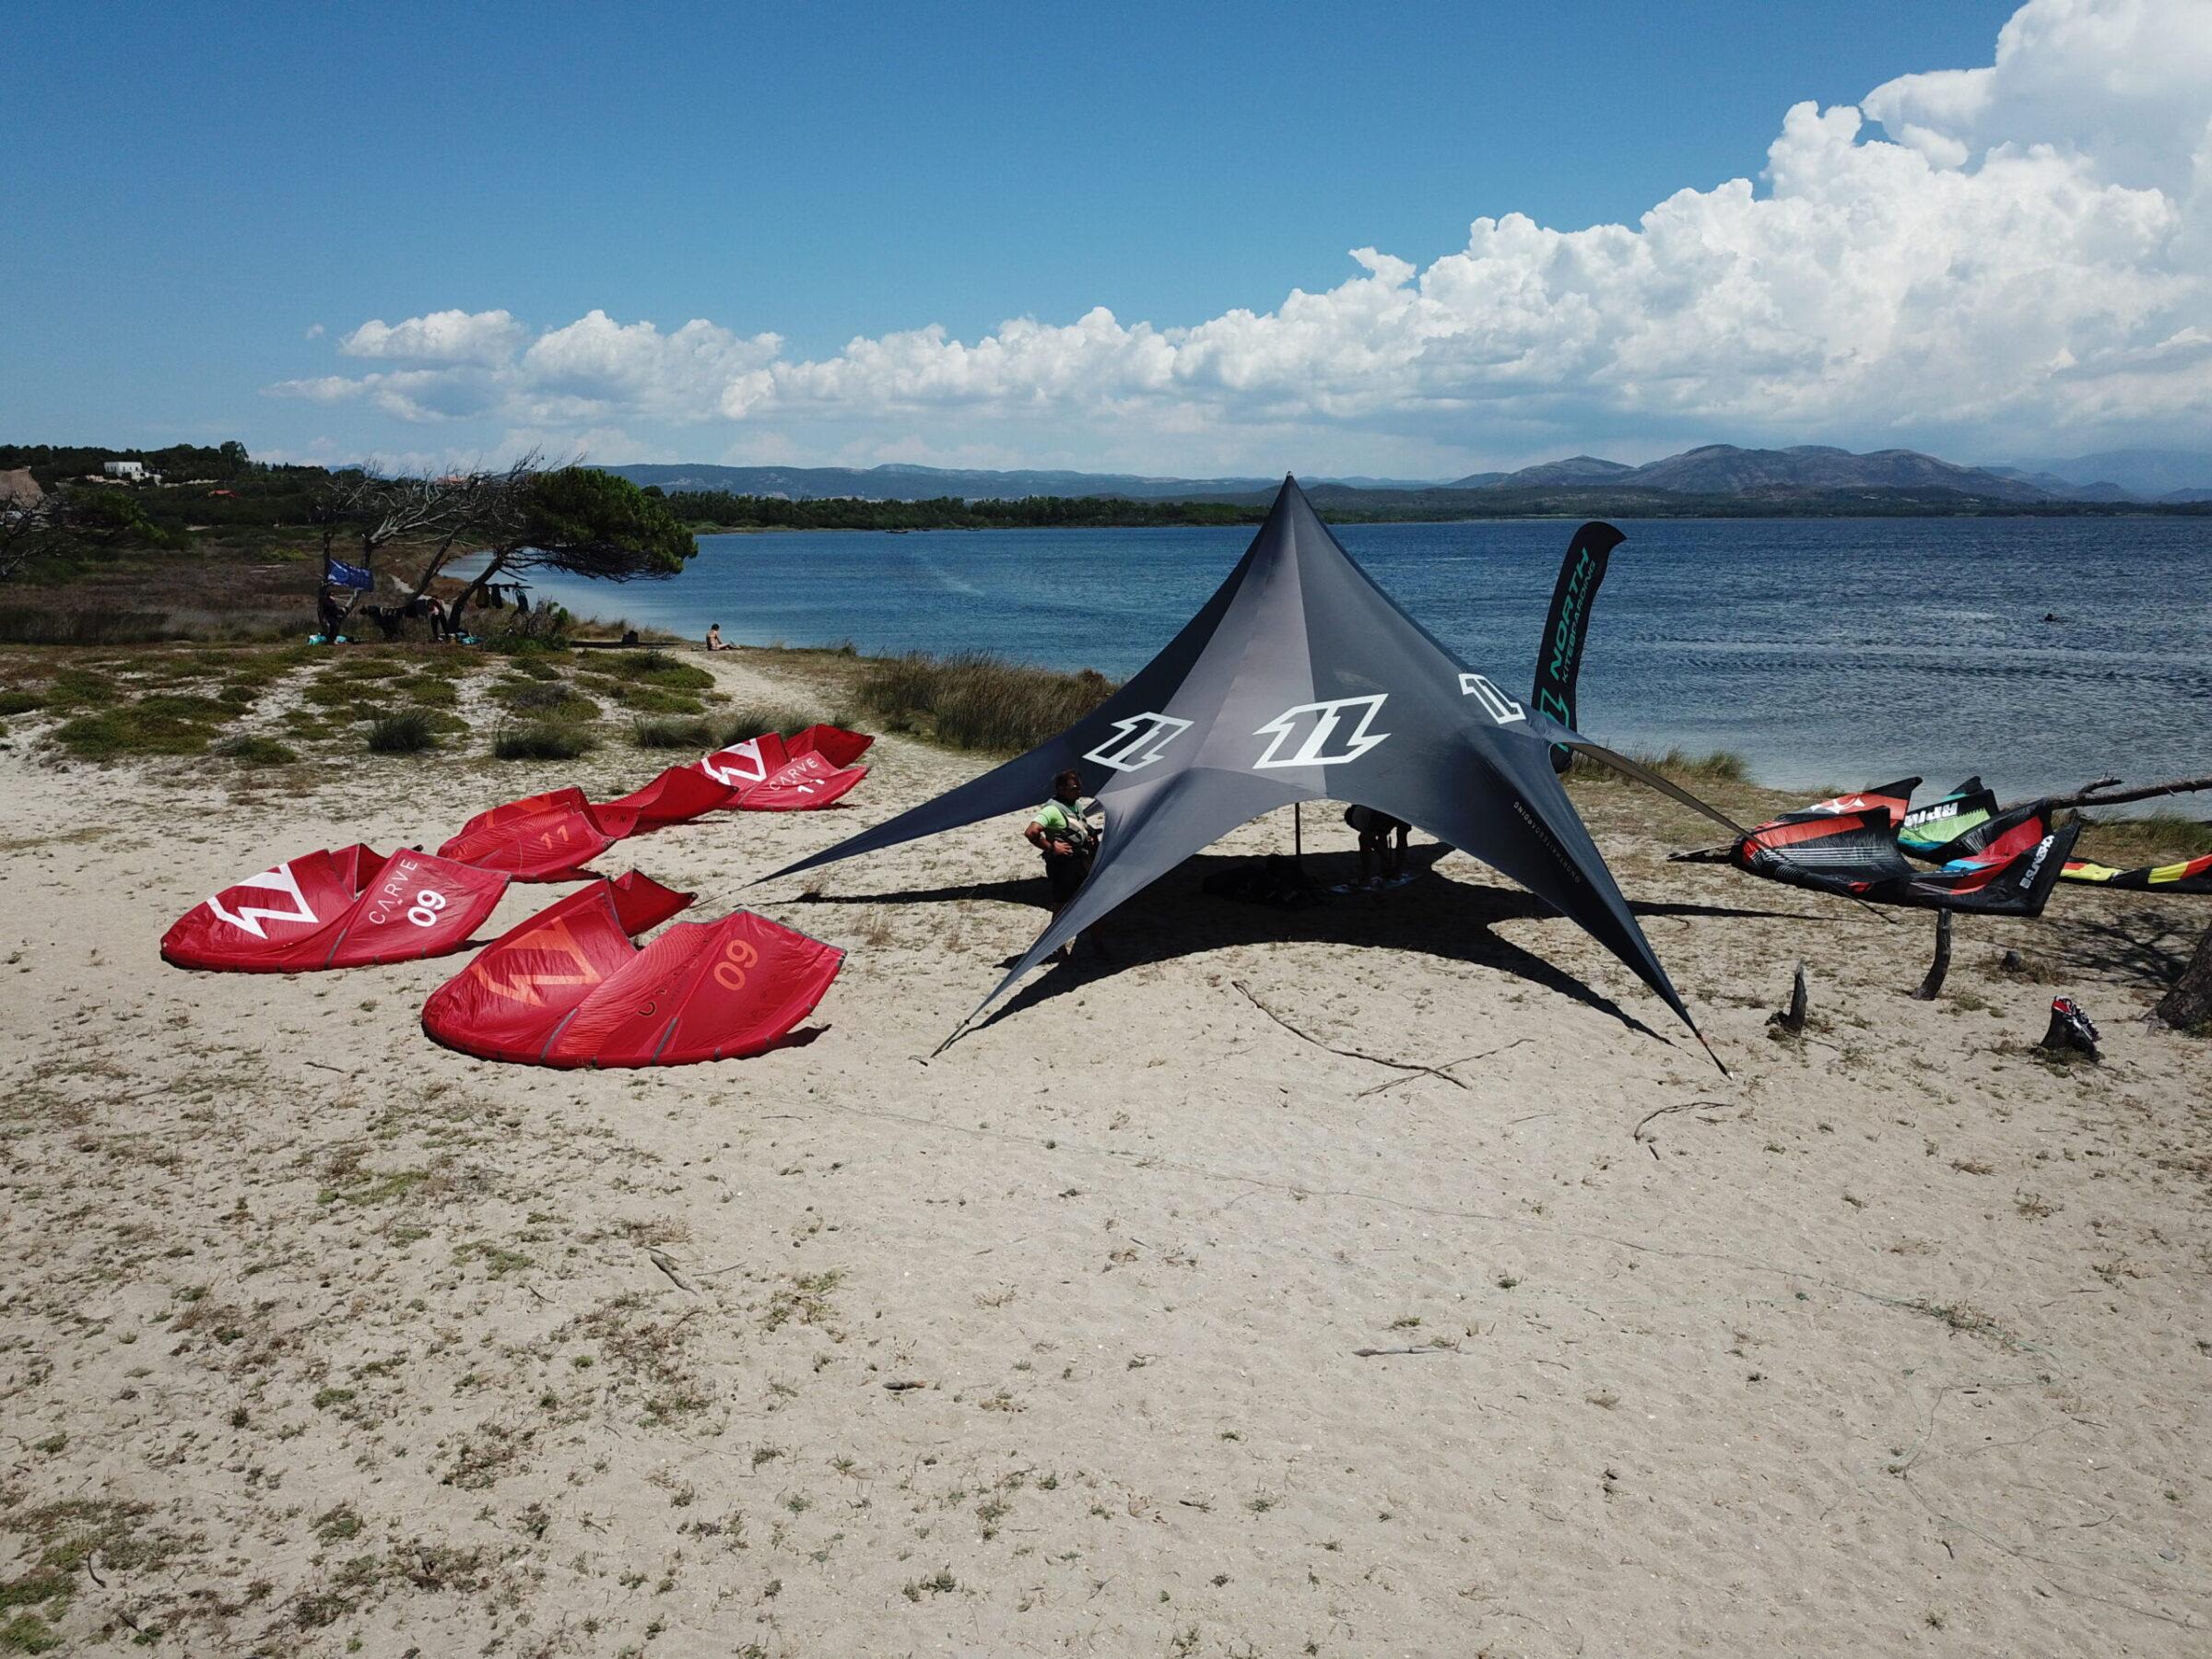 The Kite Beach of Punta Trettu in Sardinia